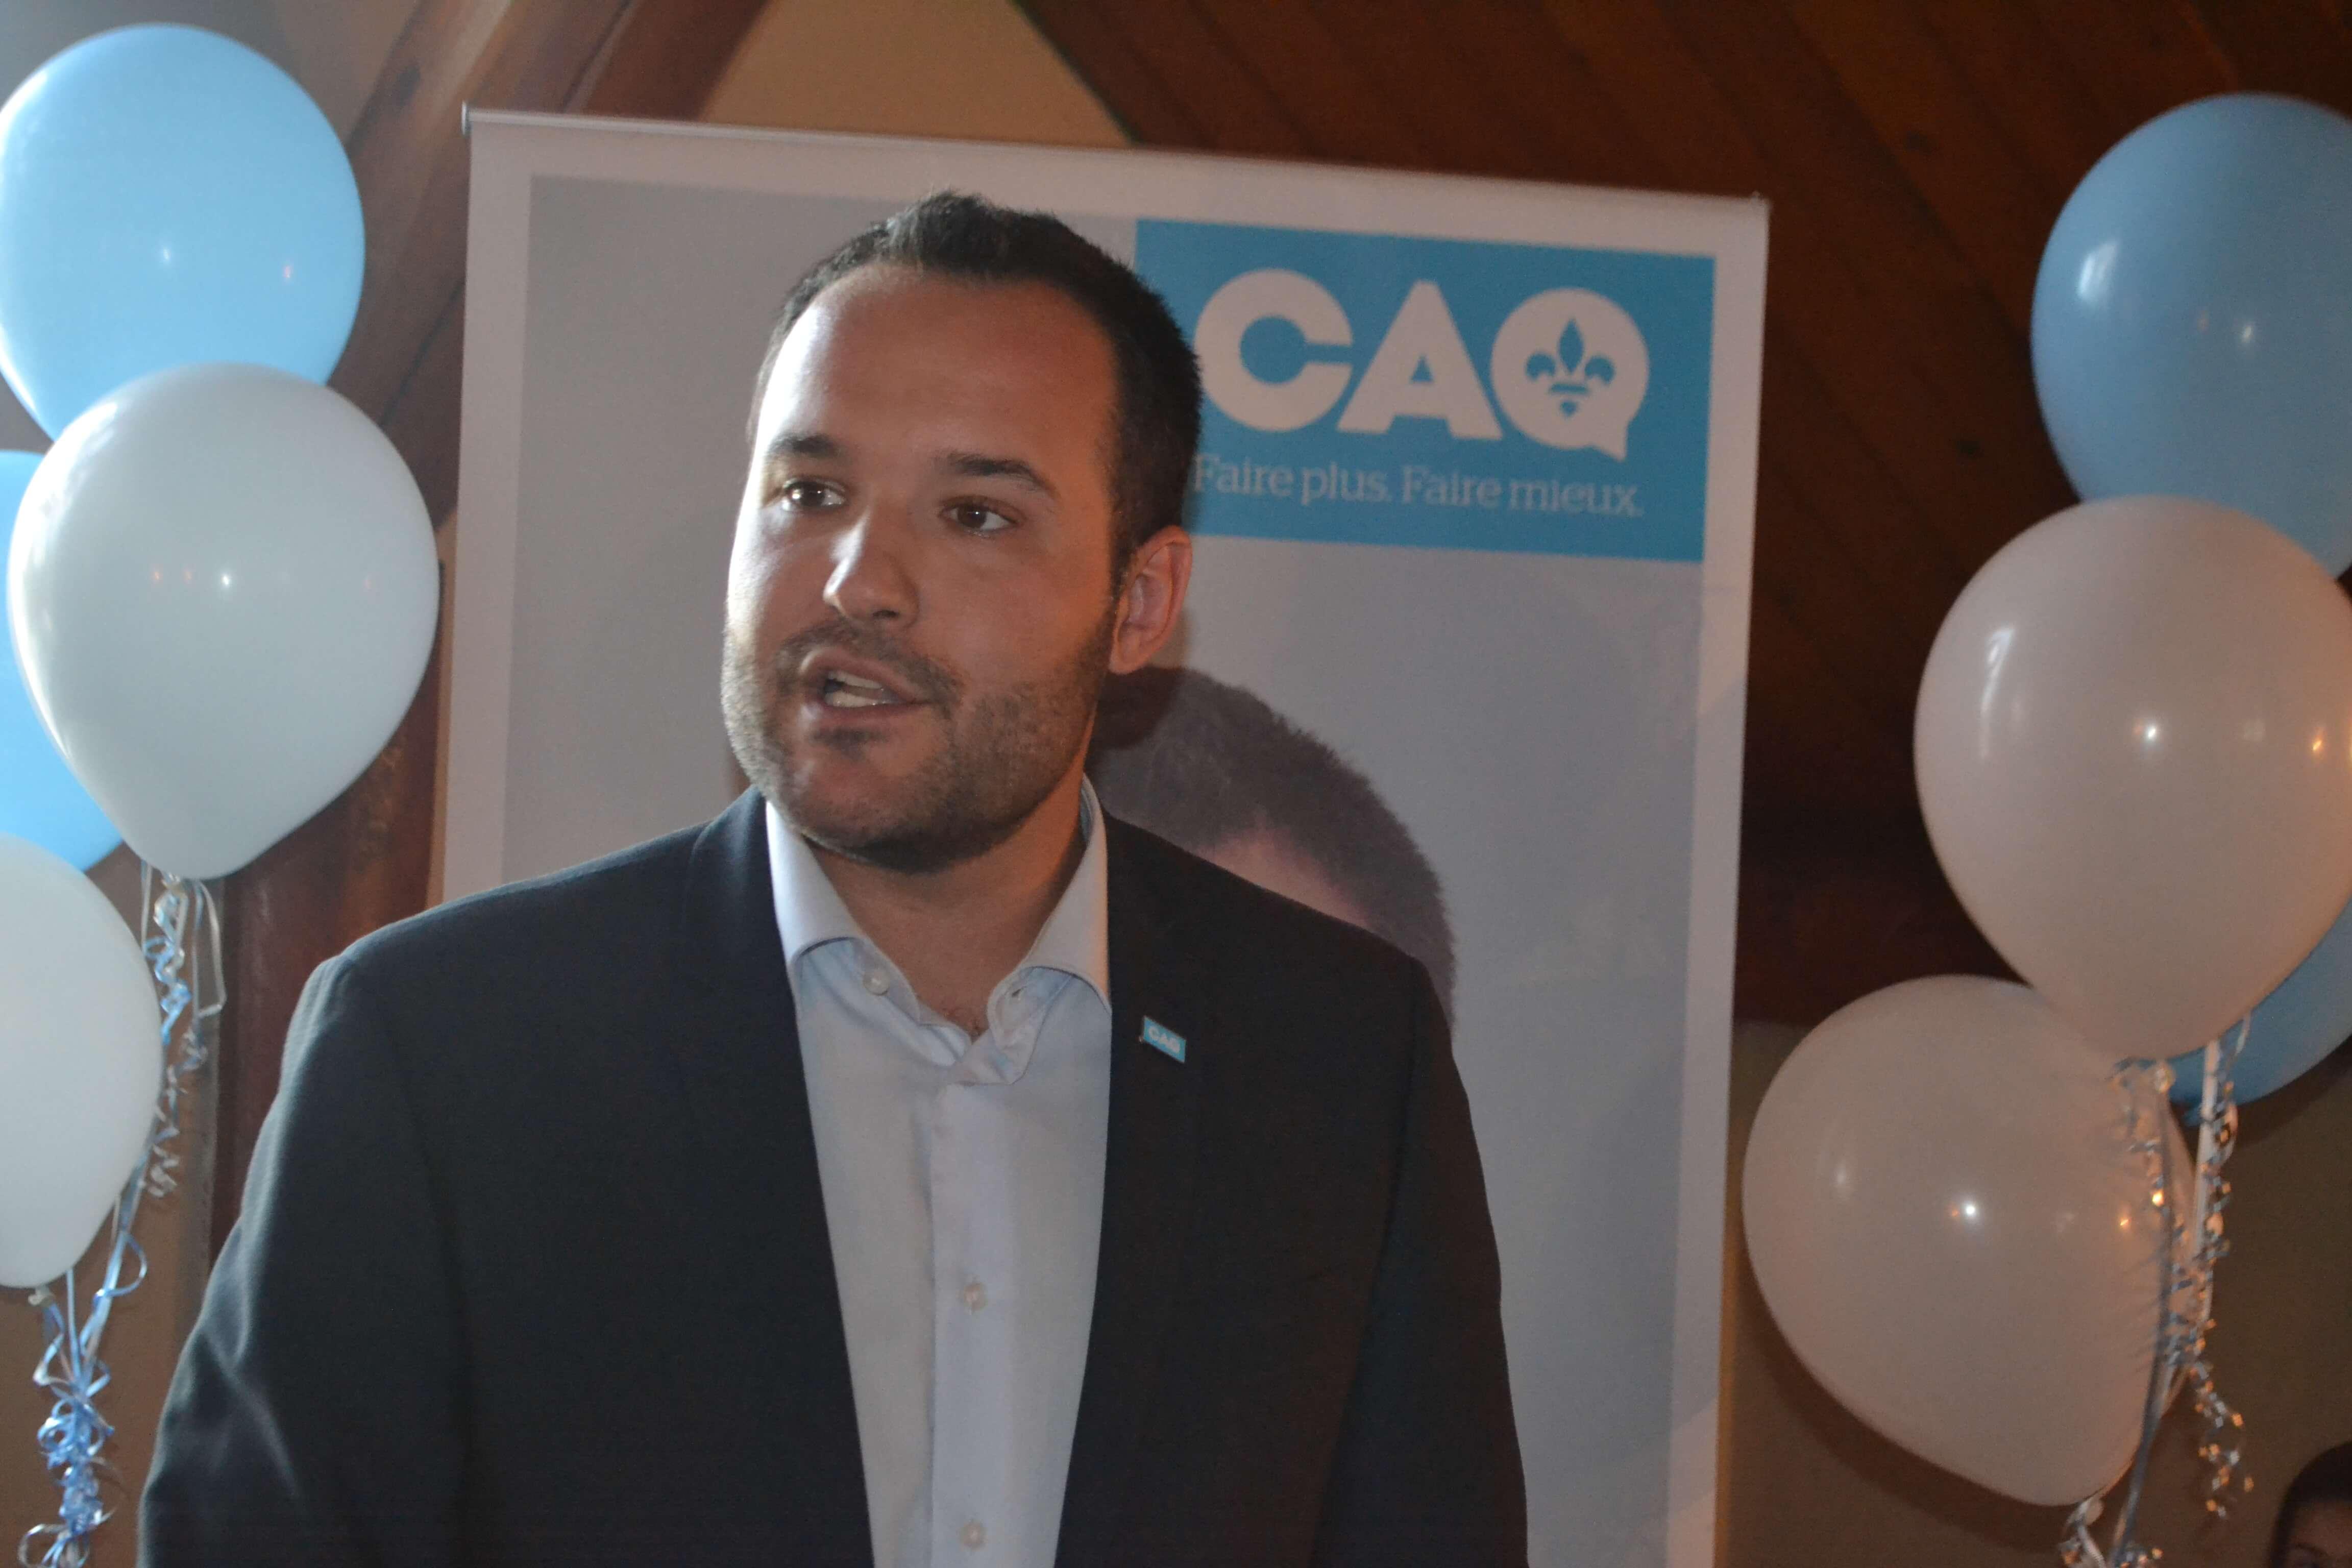 Lacombe s'engage à «travailler fort pour Papineau»